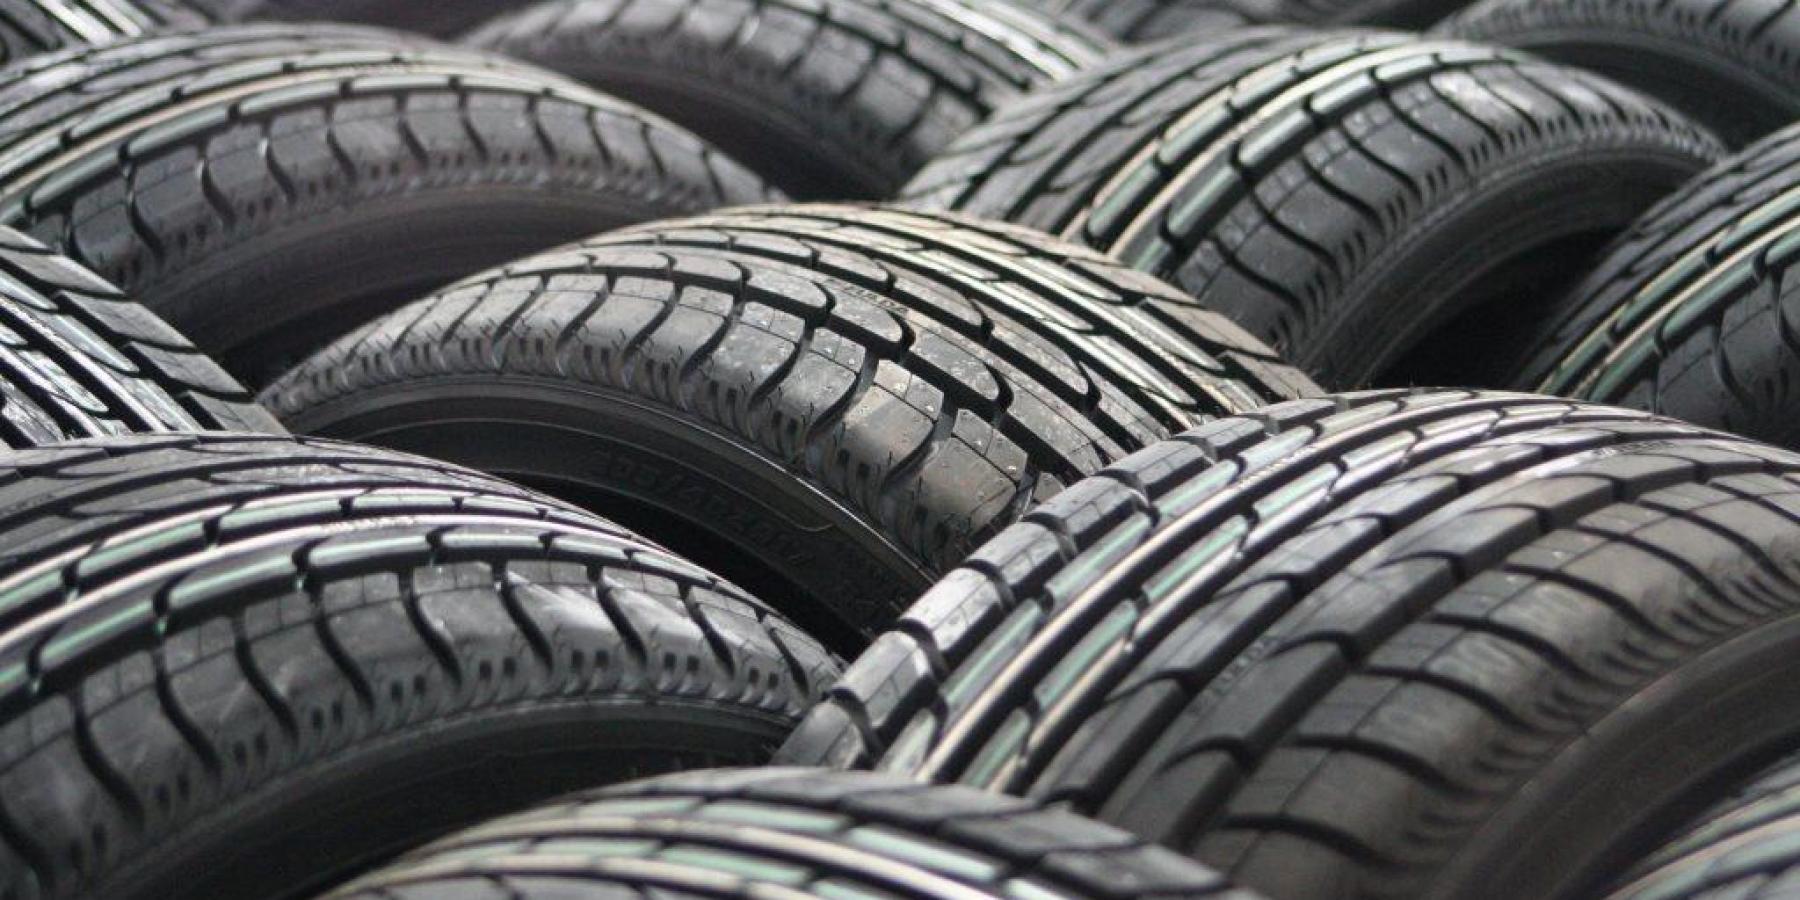 40 Reifen und Felgen gestohlen